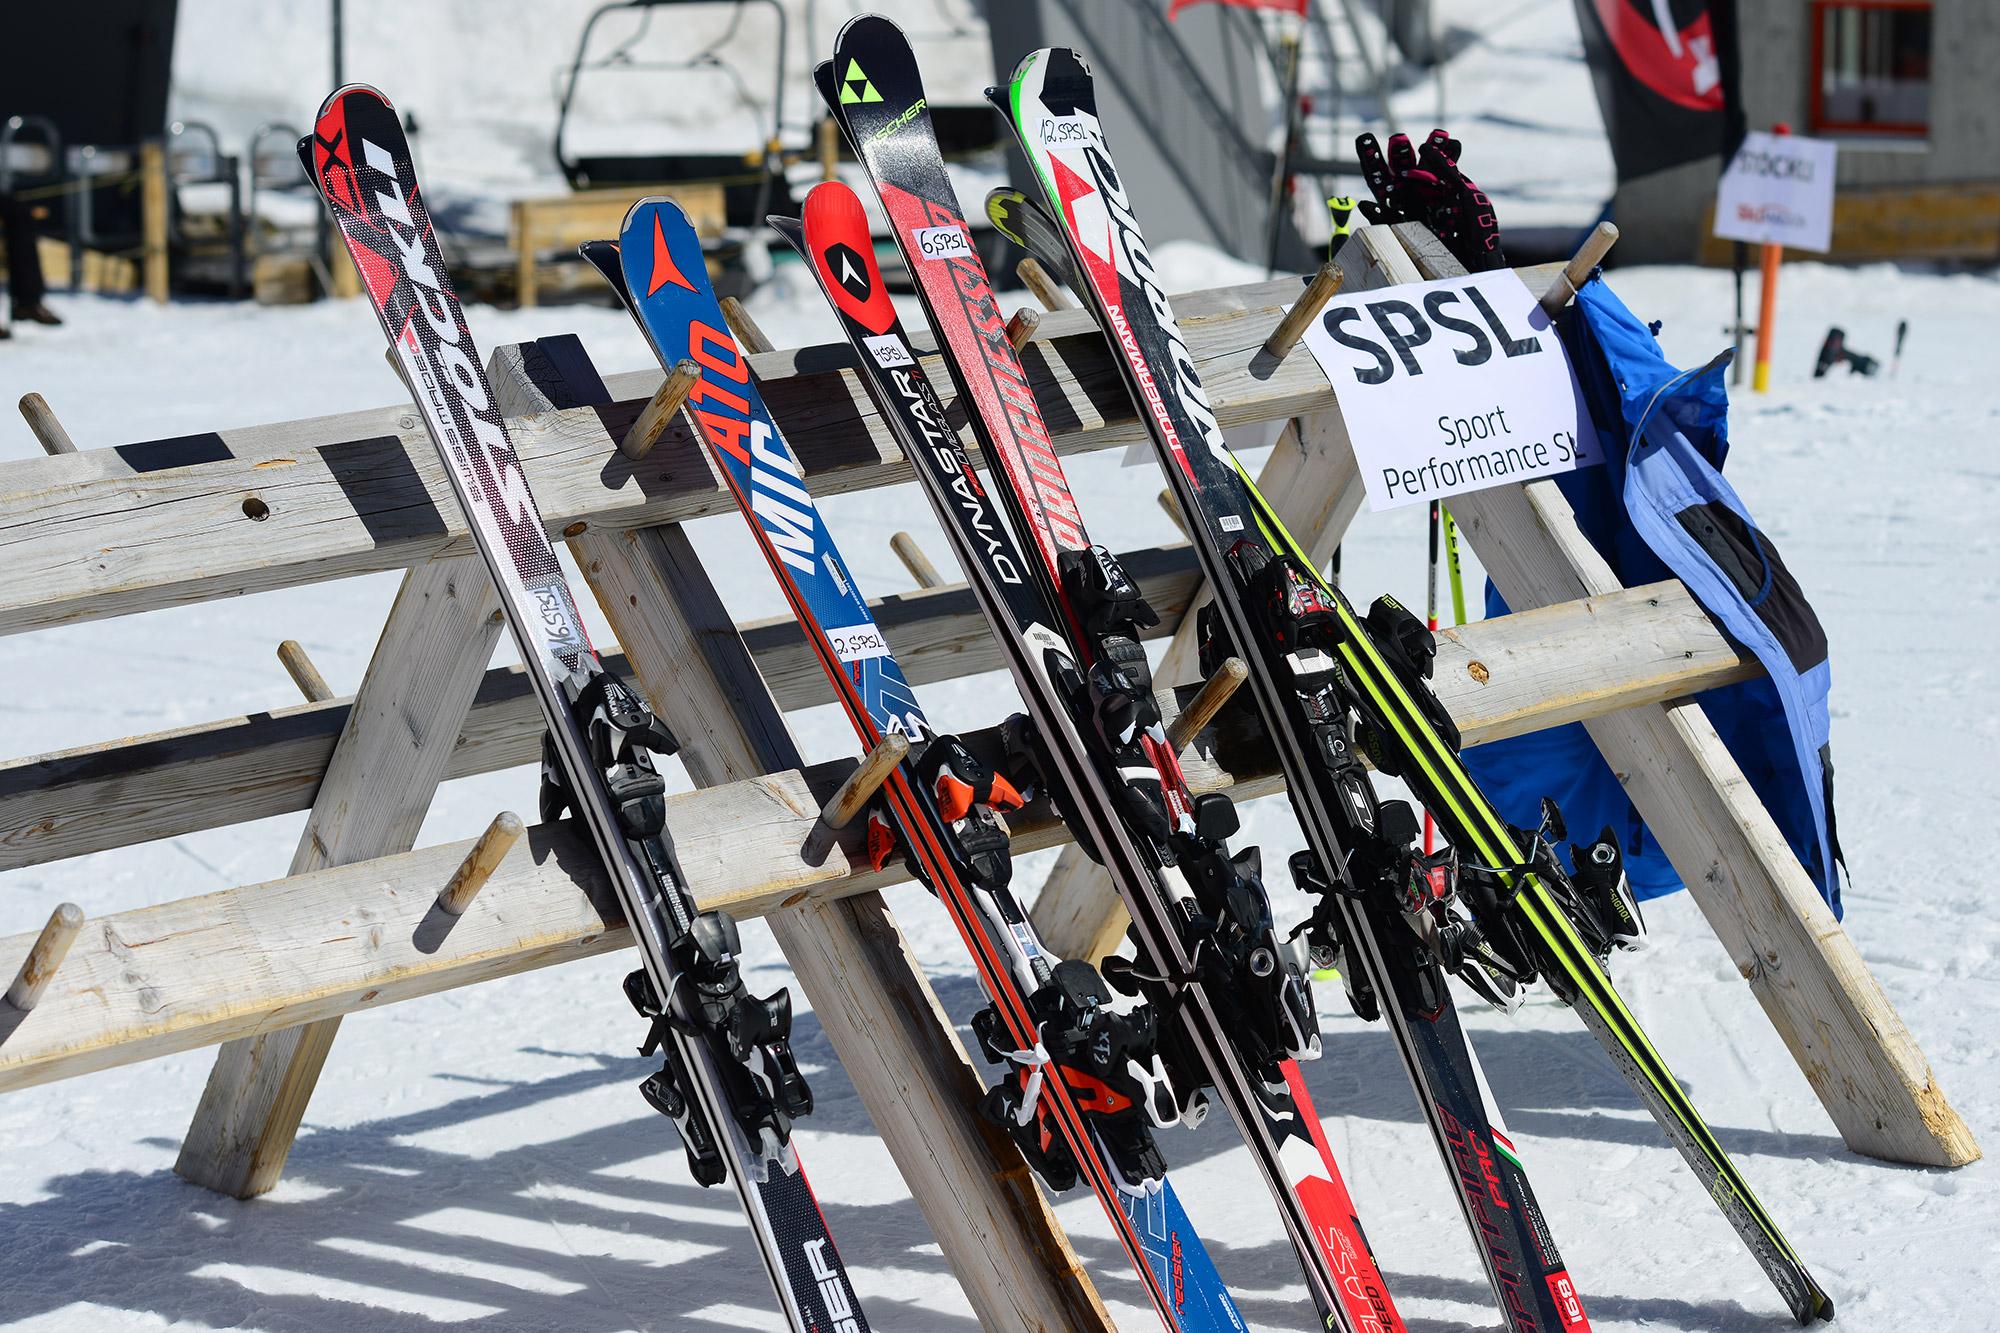 Ski Supertest - testované lyže